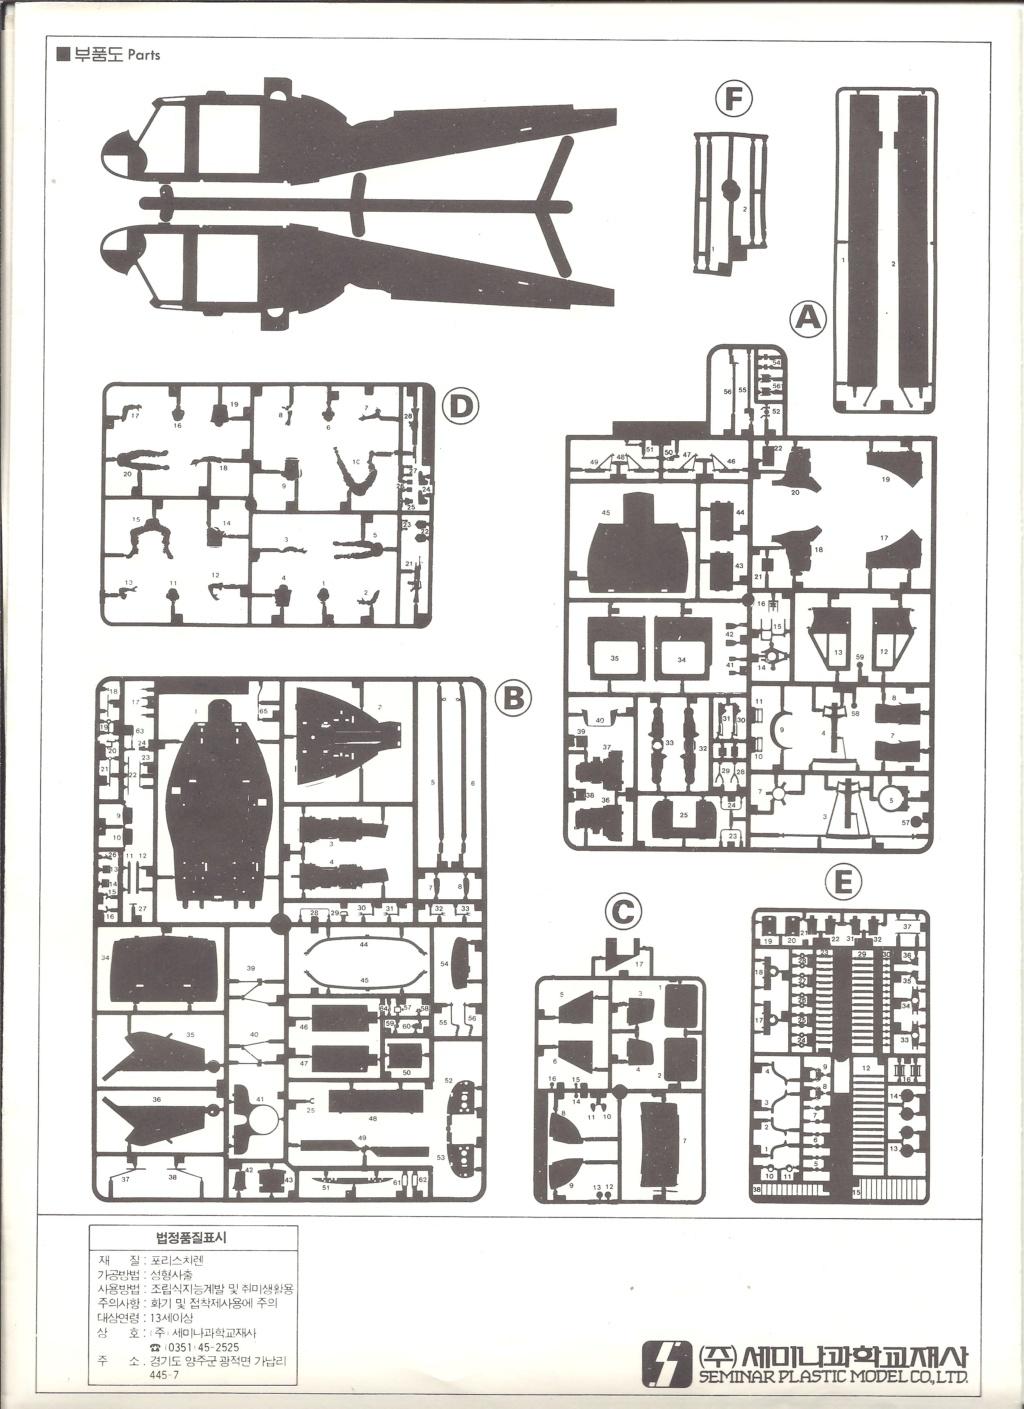 [SEMINARE] BELL UH 1B IROQUOIS 1/35ème Réf 8000 Notice Semina18